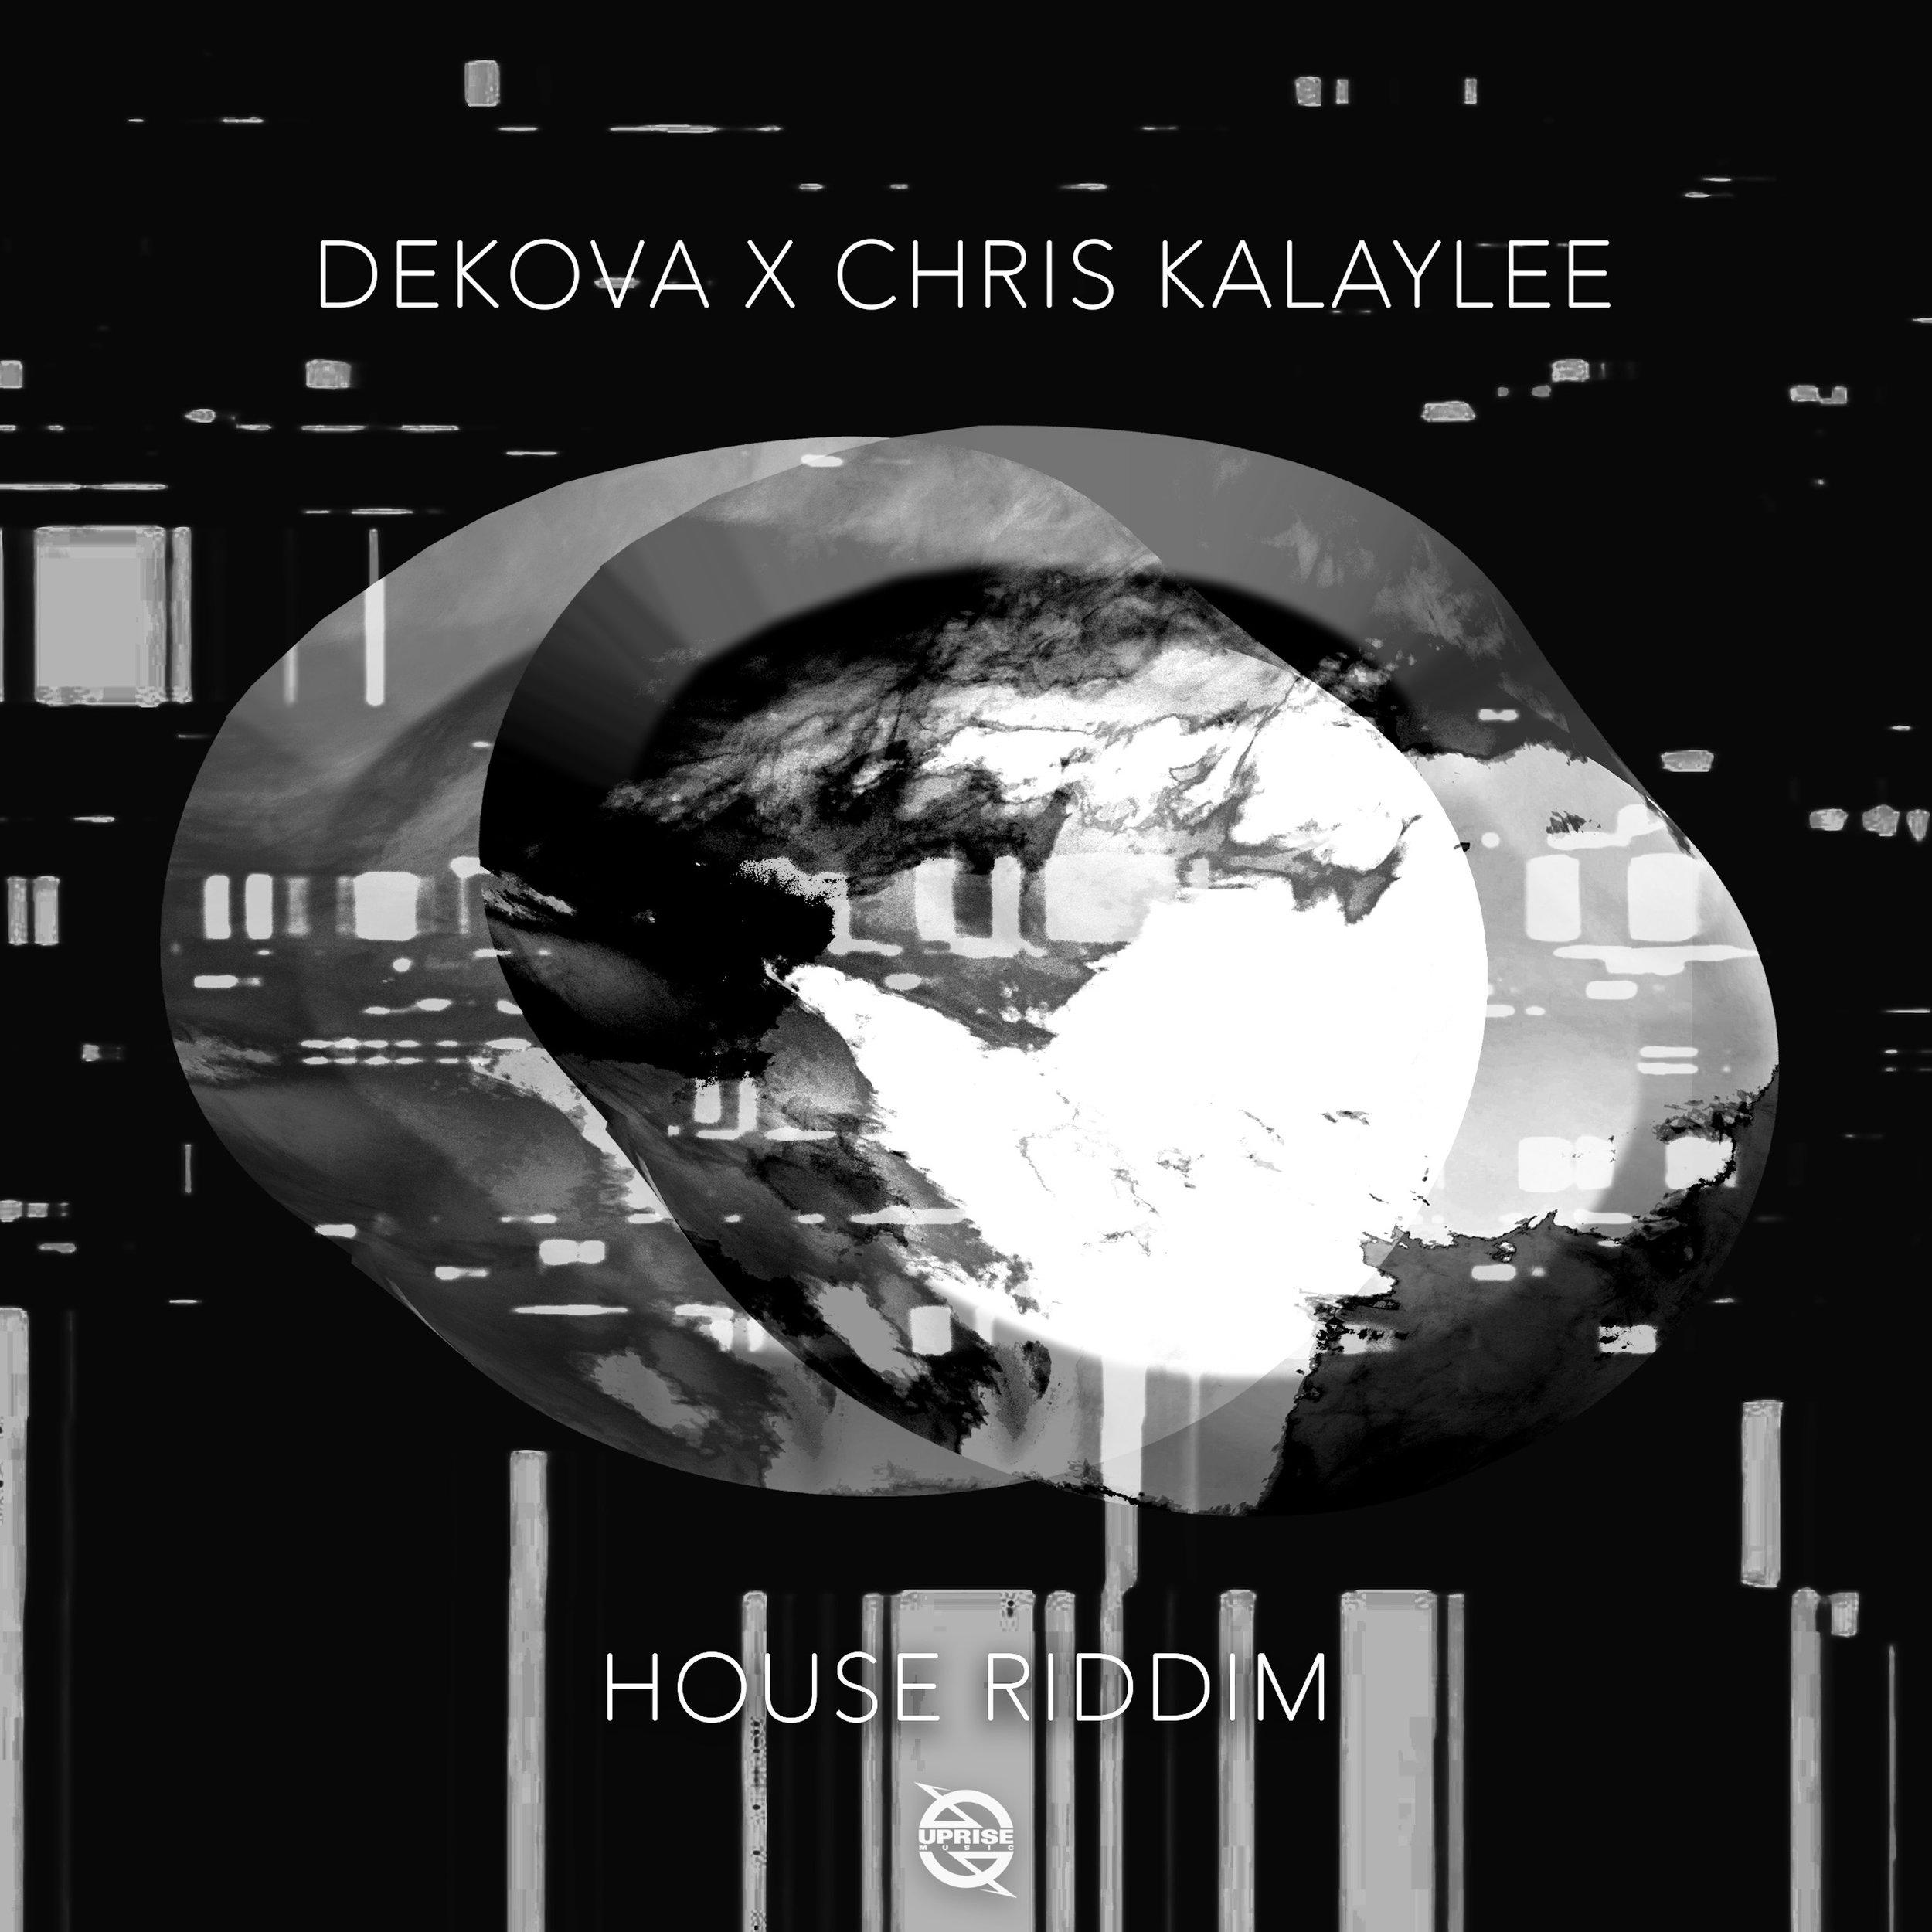 DEKOVA x Chris Kalaylee - House Riddim